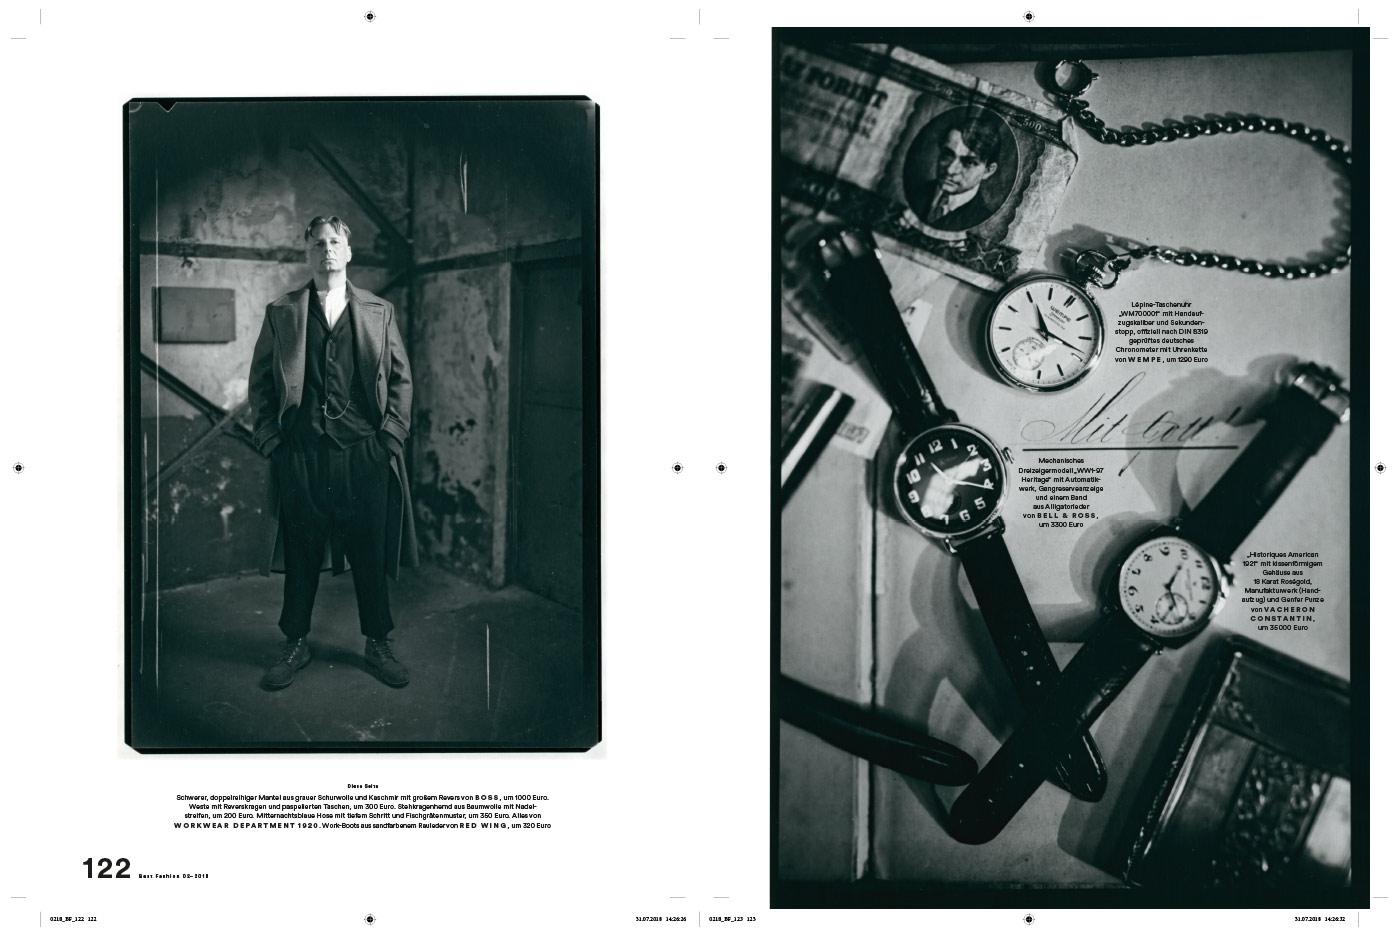 Bettina-Lewin-Photographer-and-Director-MUSS-SITZEN-4